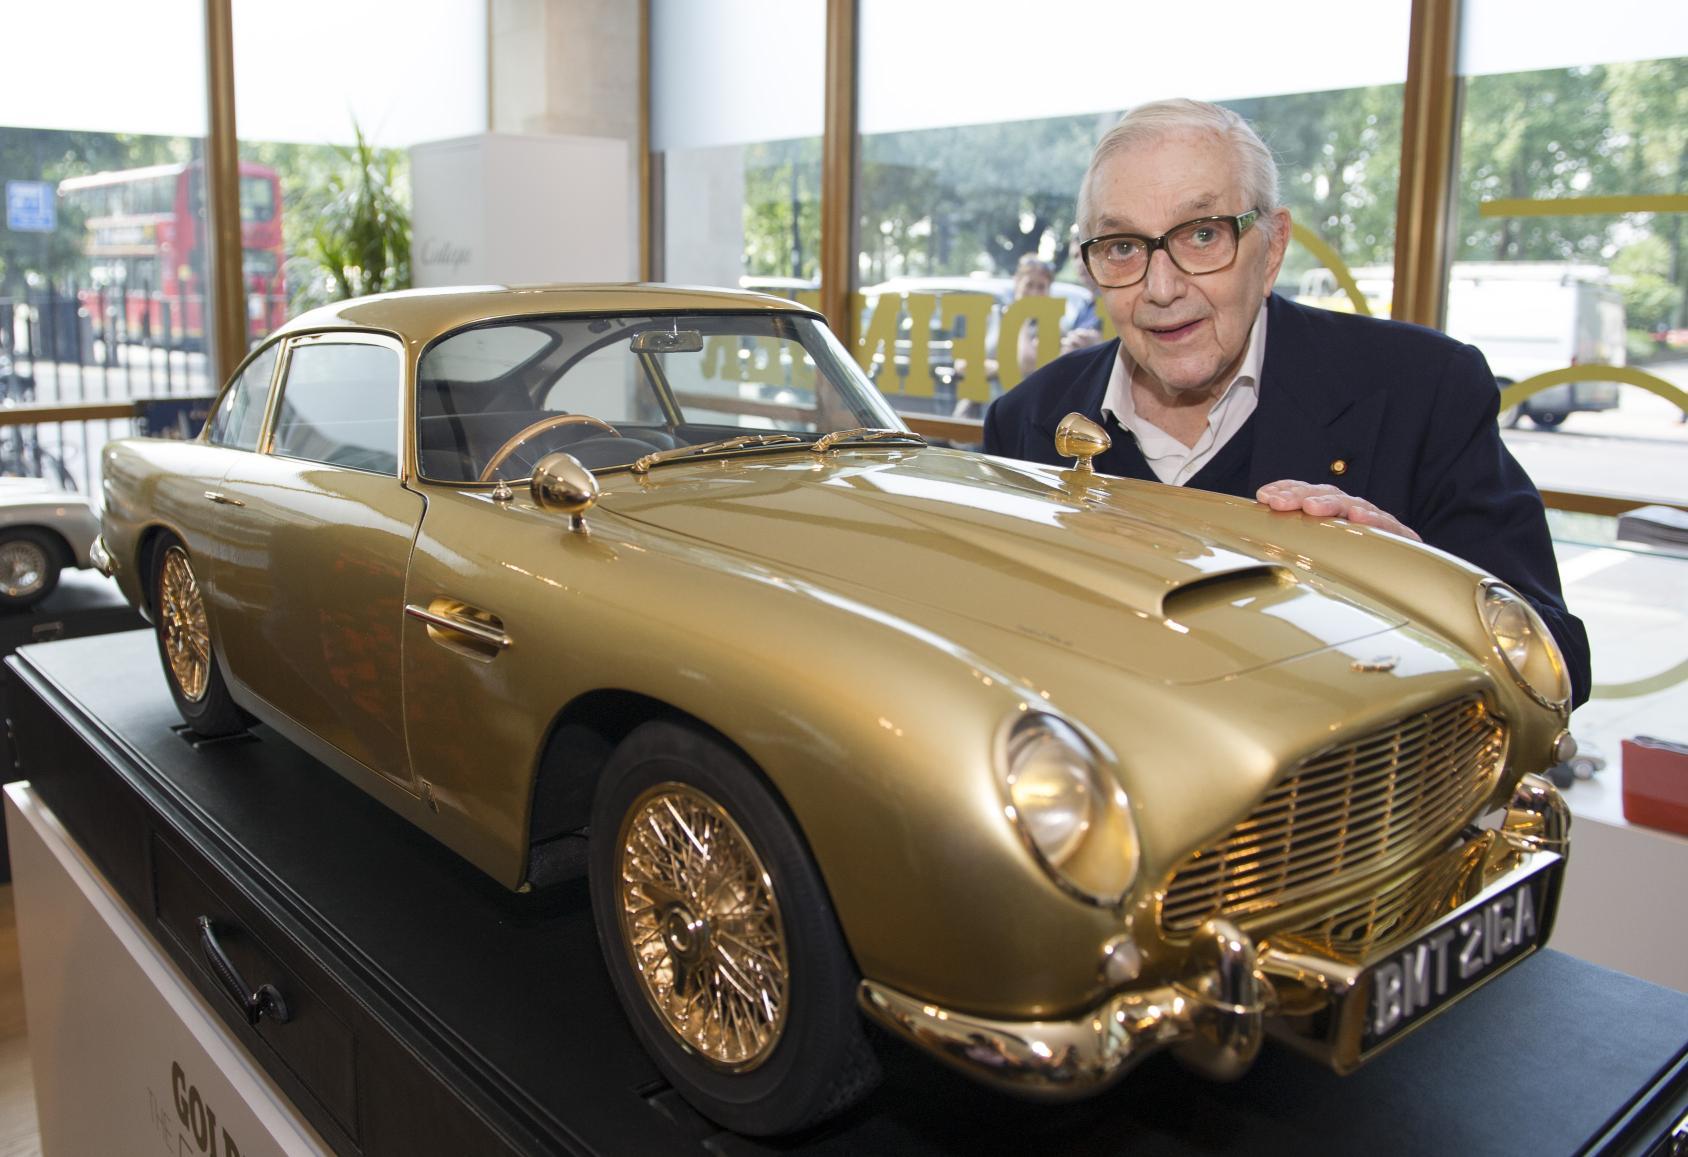 Gold Aston Martin Db5 Model Car Heading To Auction